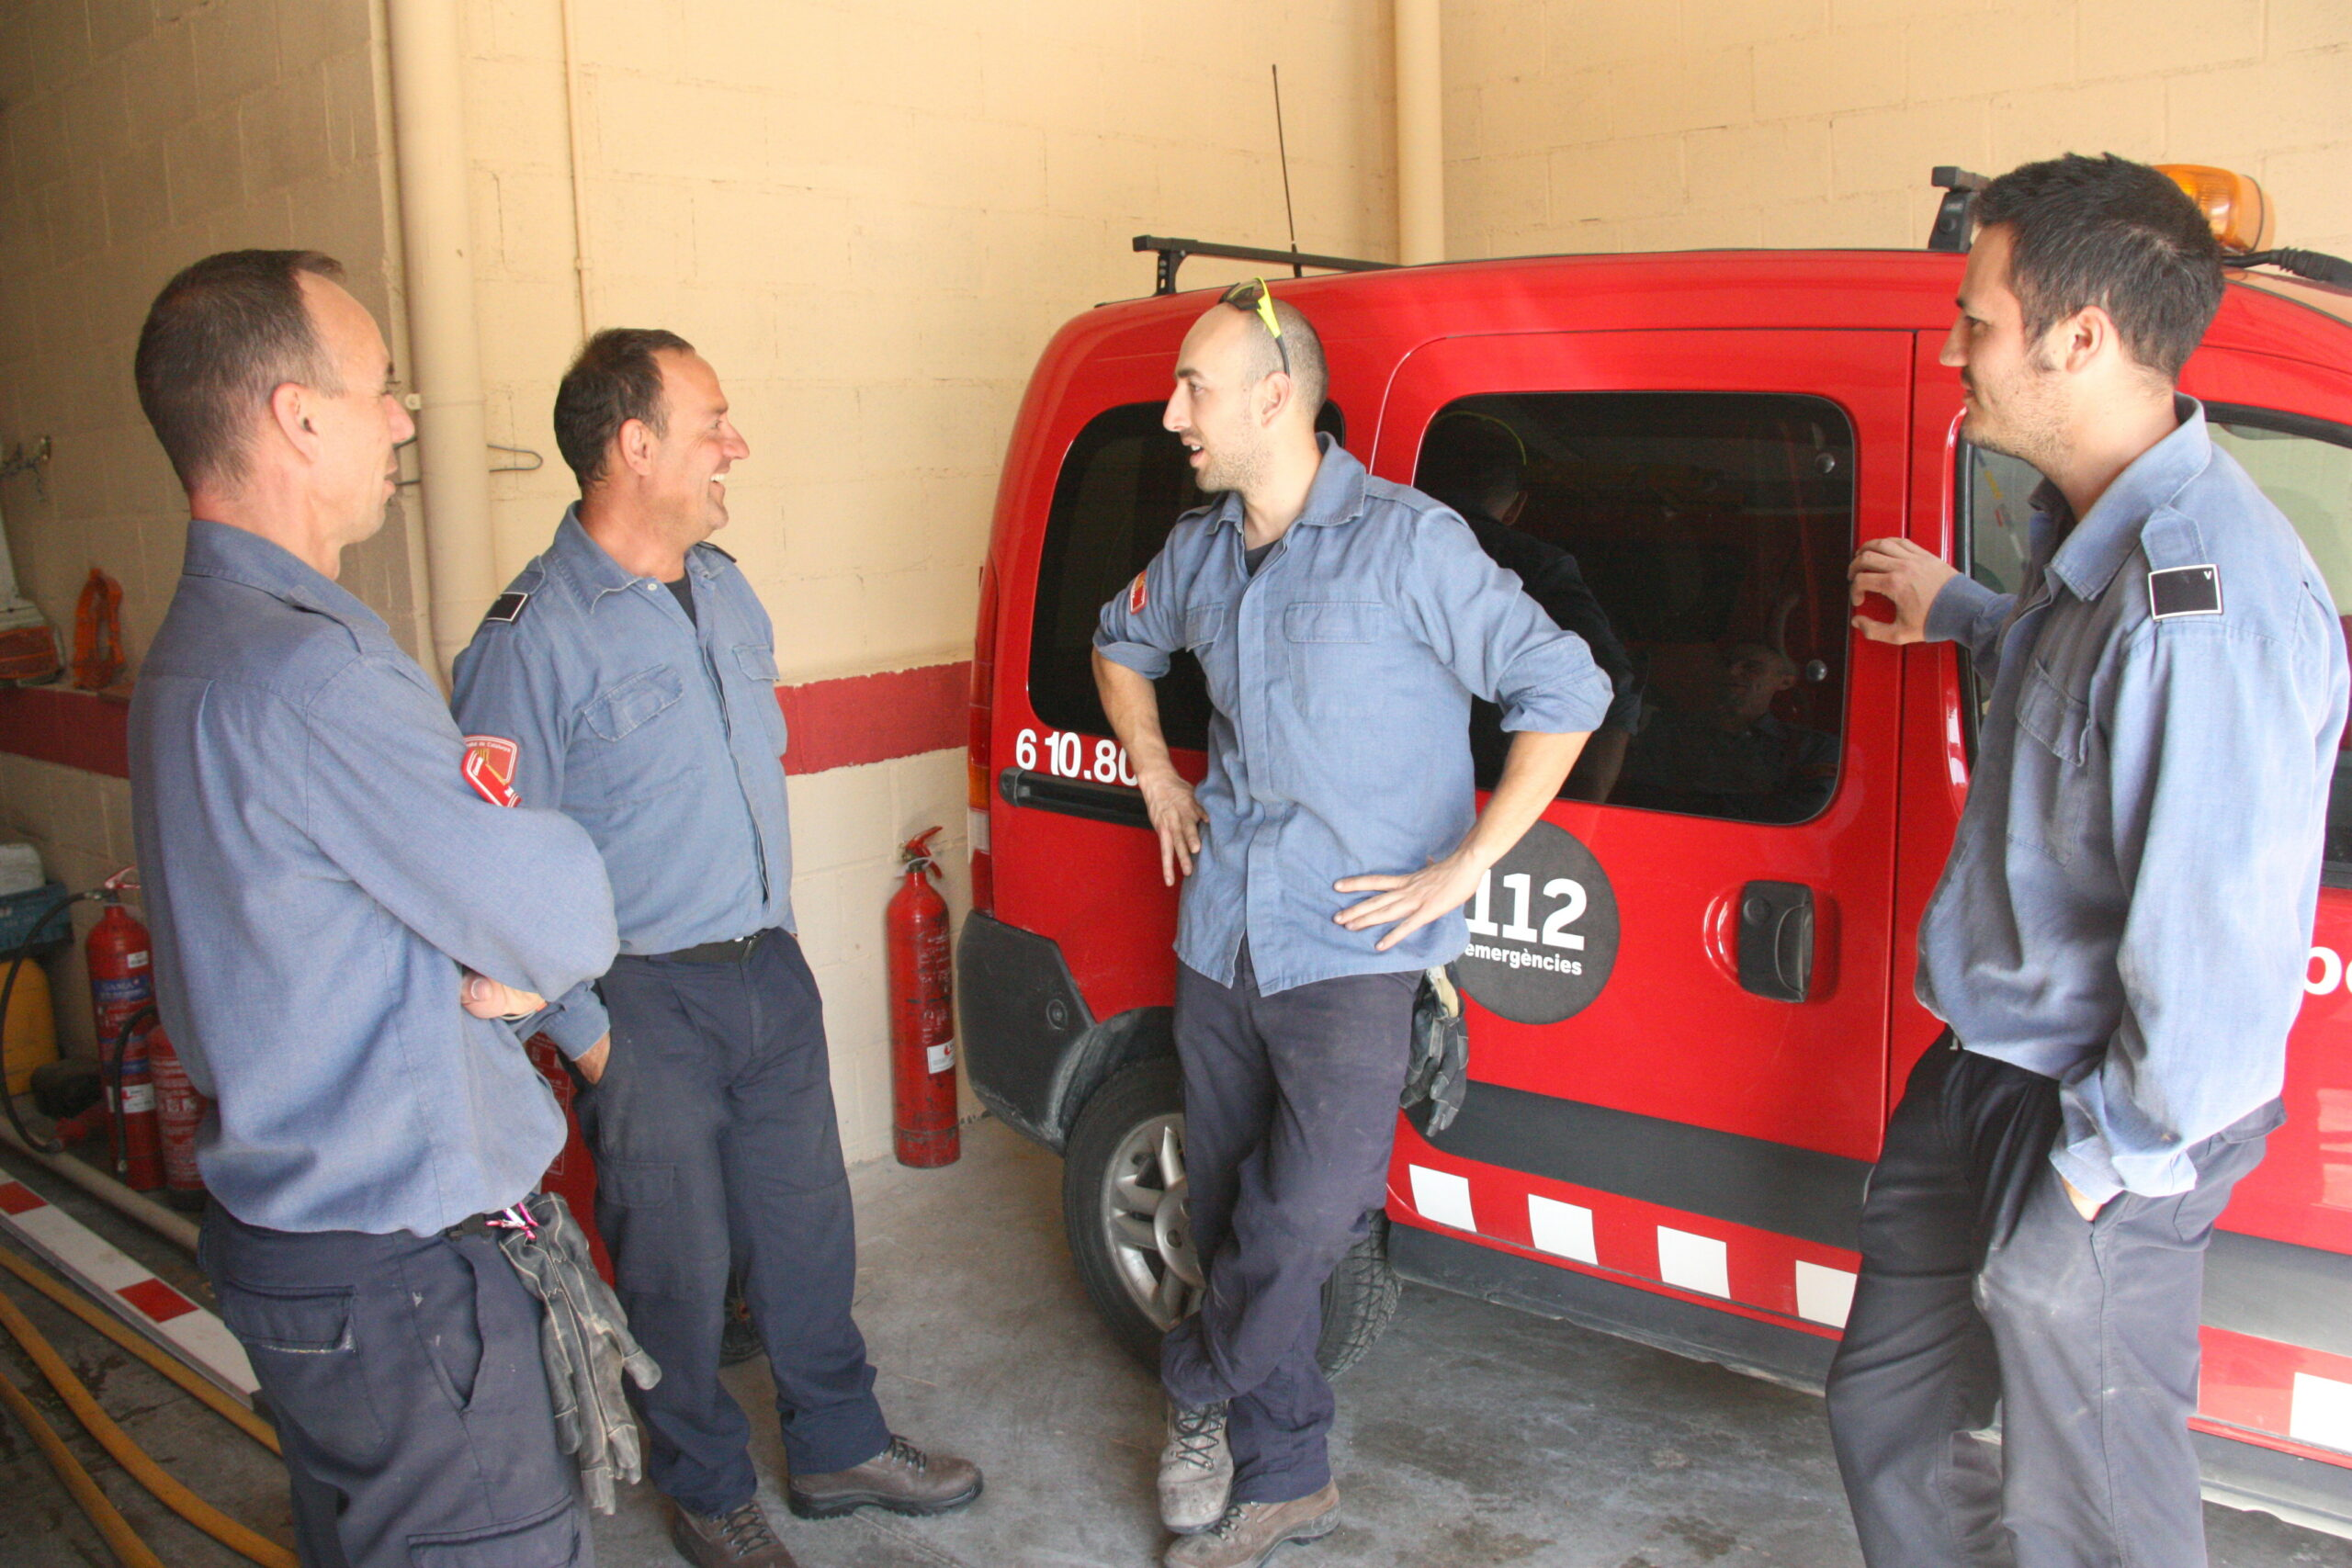 bombers voluntaris del parc de Santa Coloma de Queralt, conversant/ArxiuACN